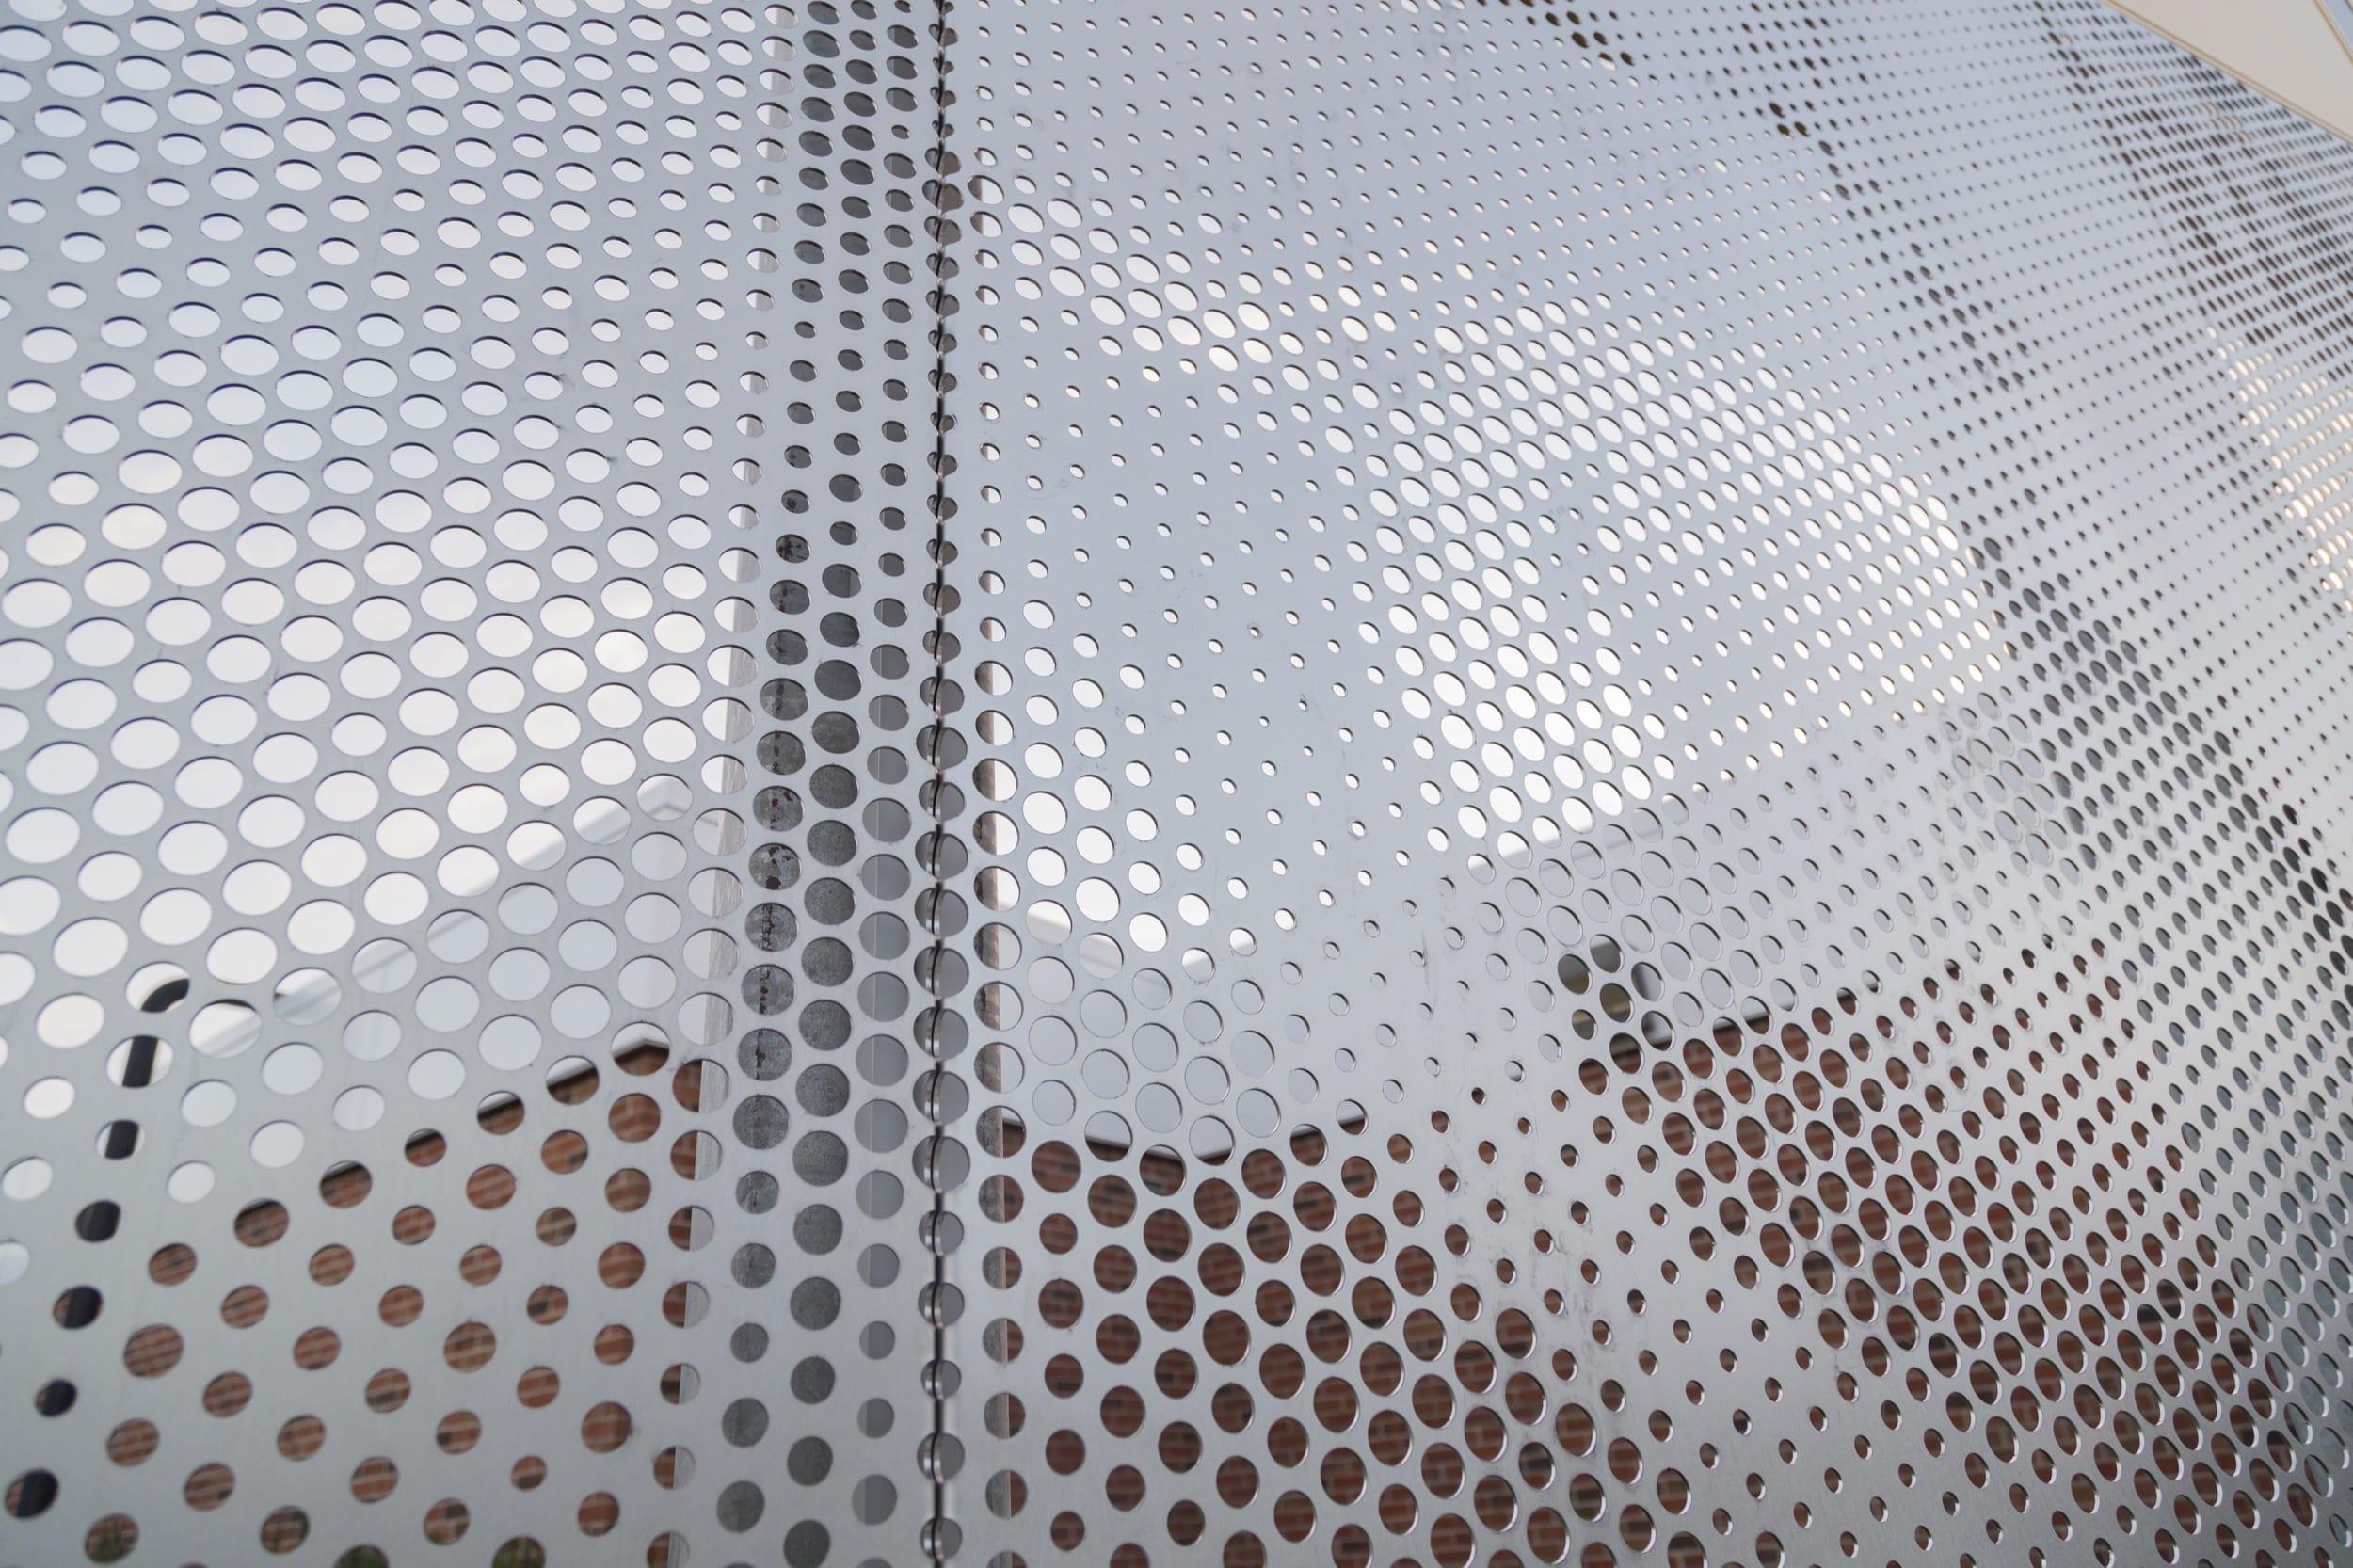 Angel hair stainless steel screens depicting the school's mascot.